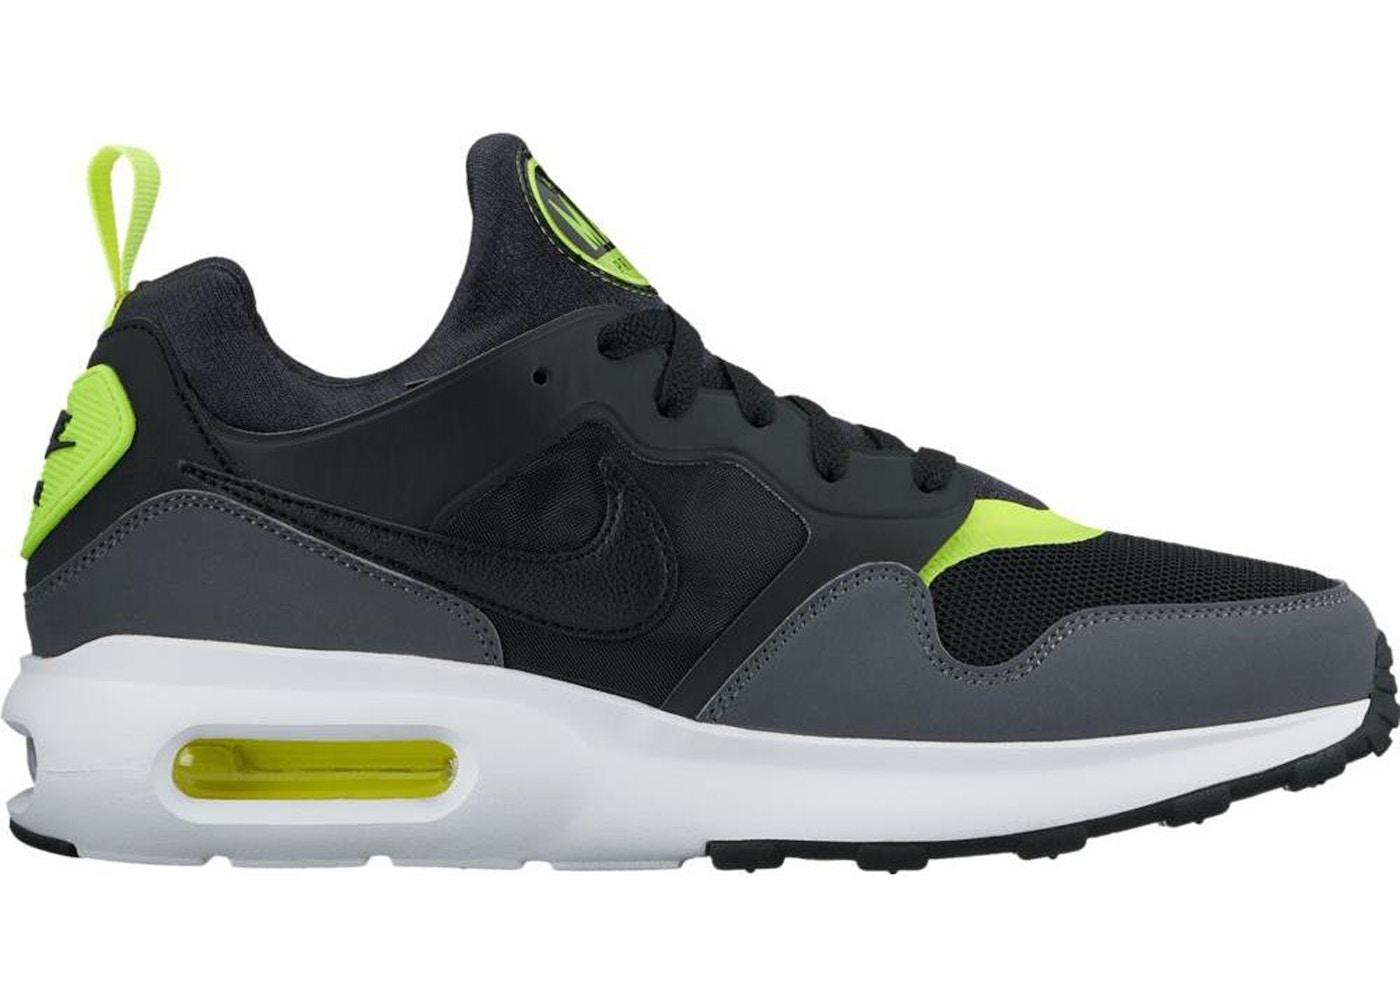 Nike Air Max Prime Black Volt - 876068-005